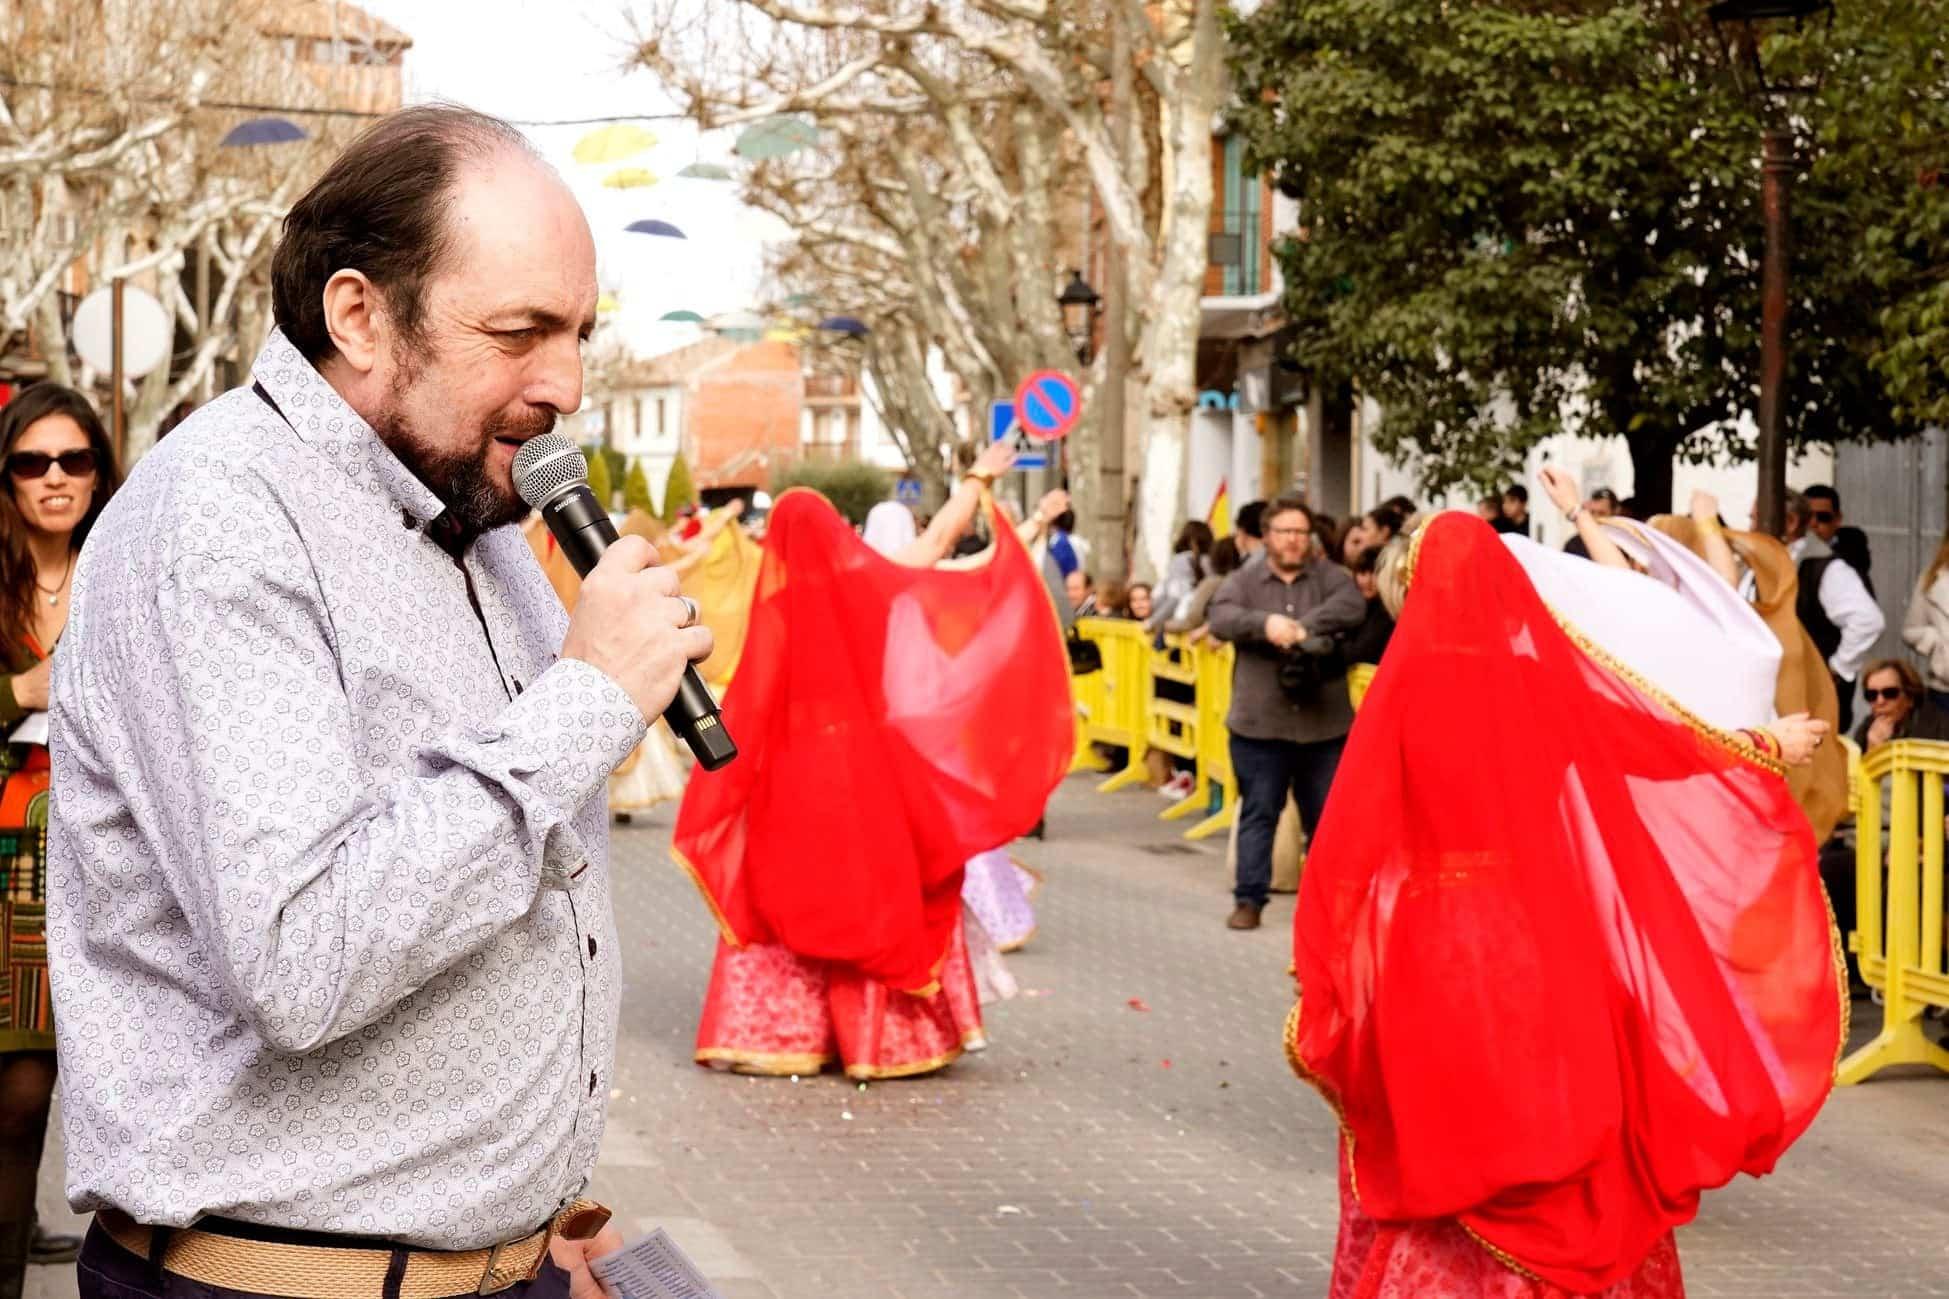 Carnaval de herencia 2020 ofertorio 153 - Selección de fotografías del Ofertorio del Carnaval de Herencia